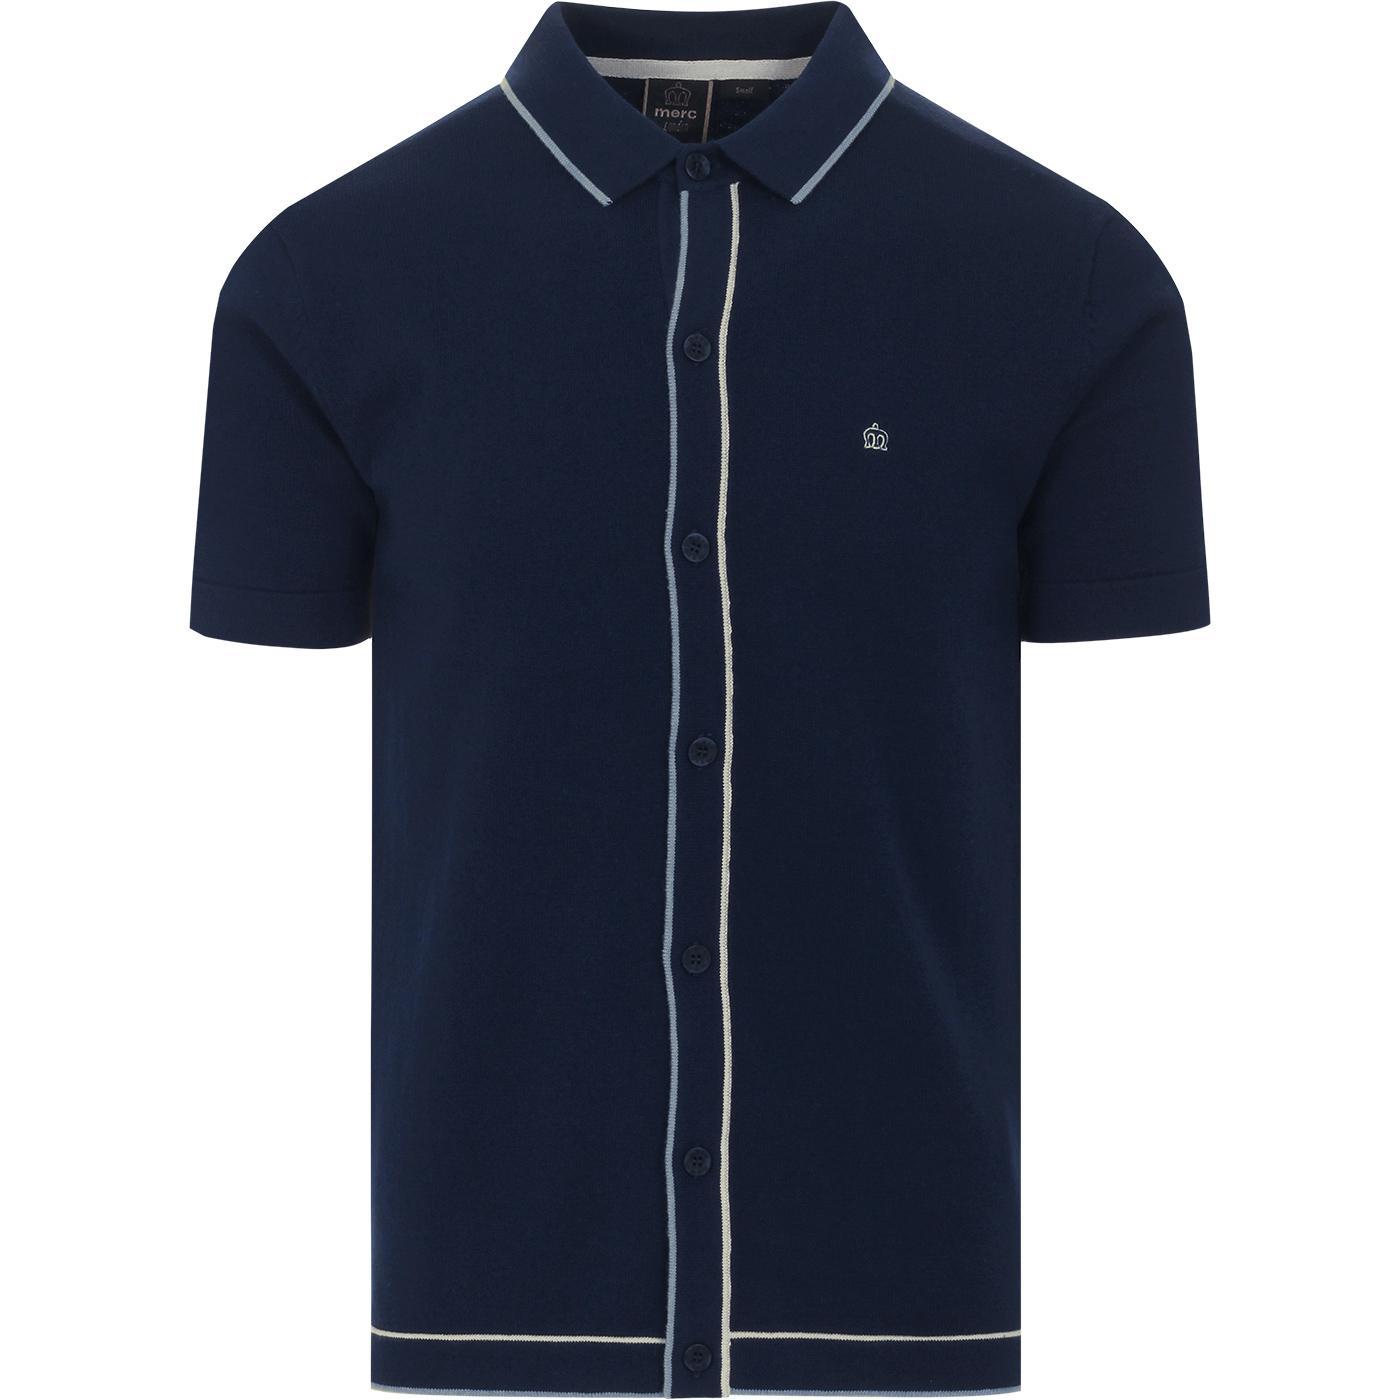 Devon MERC Mod Tipped Knit Button Through Polo (N)